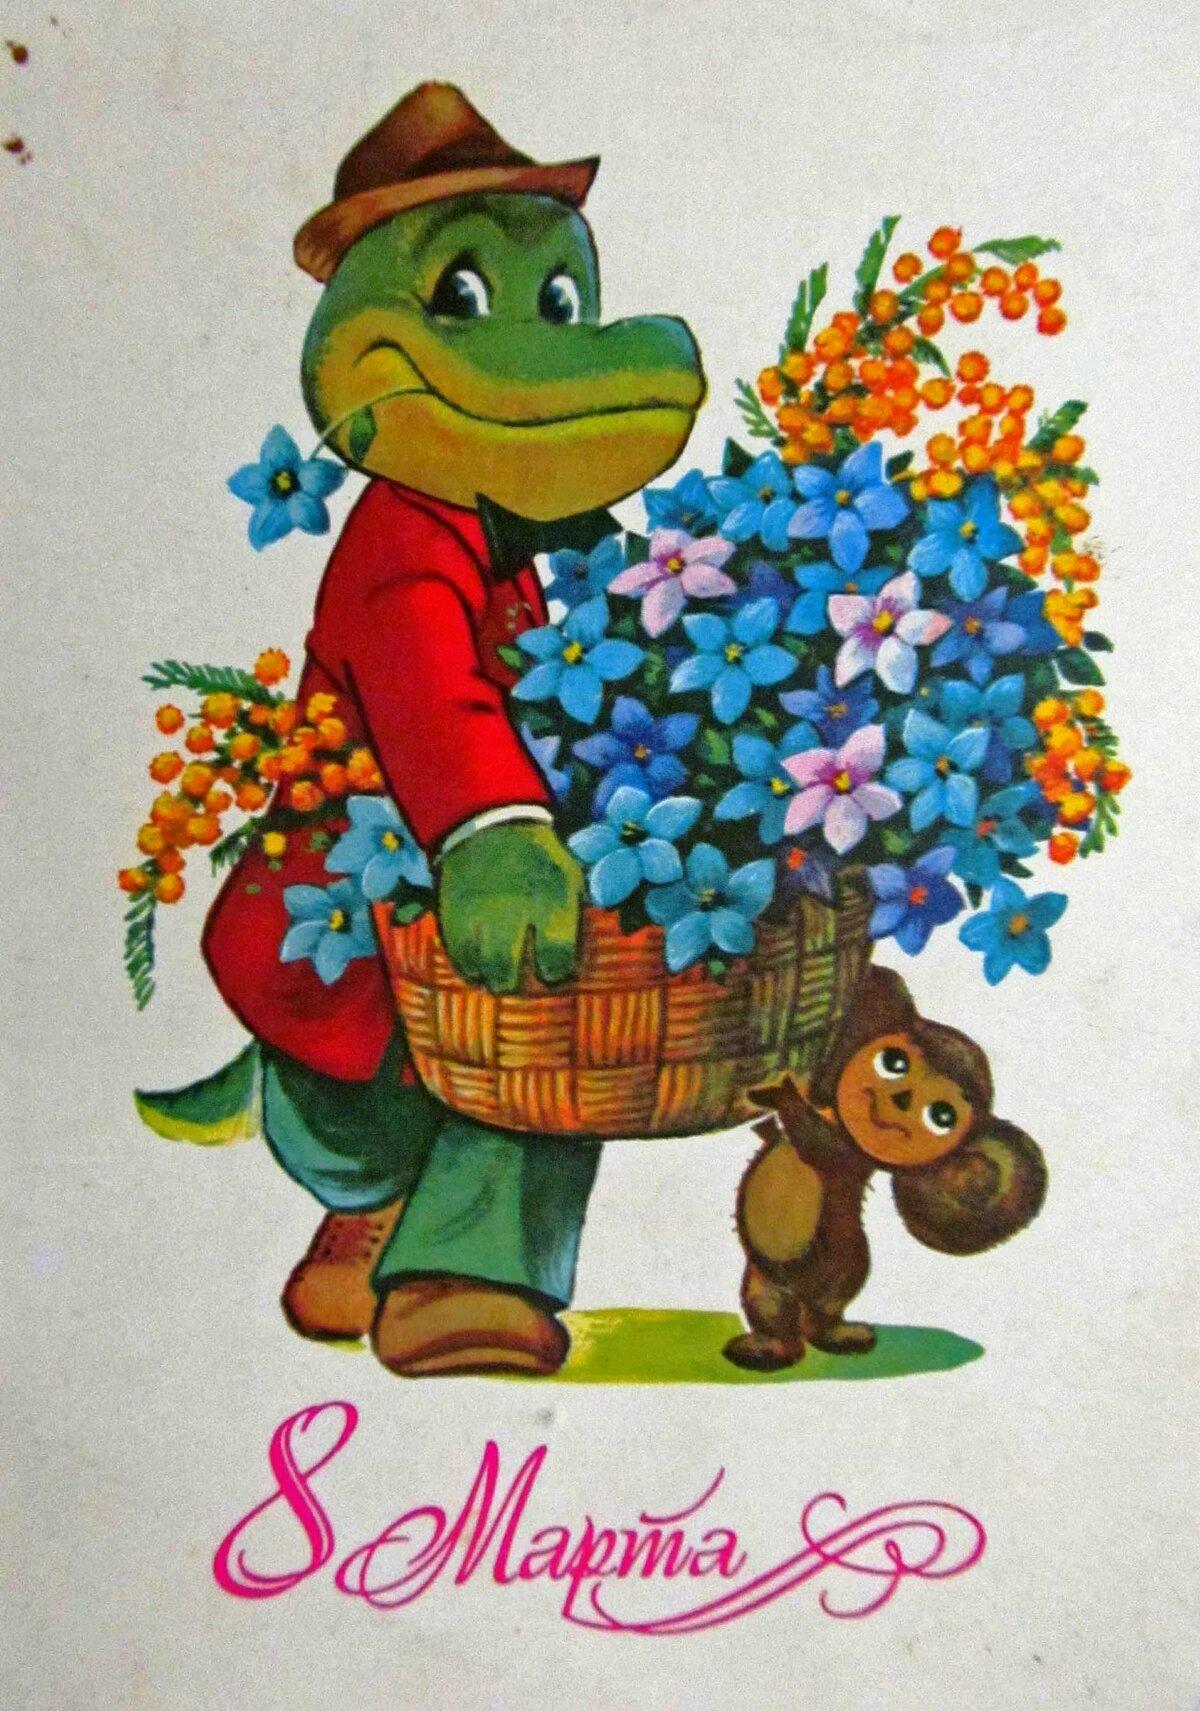 Открытки советских времен с 8 марта